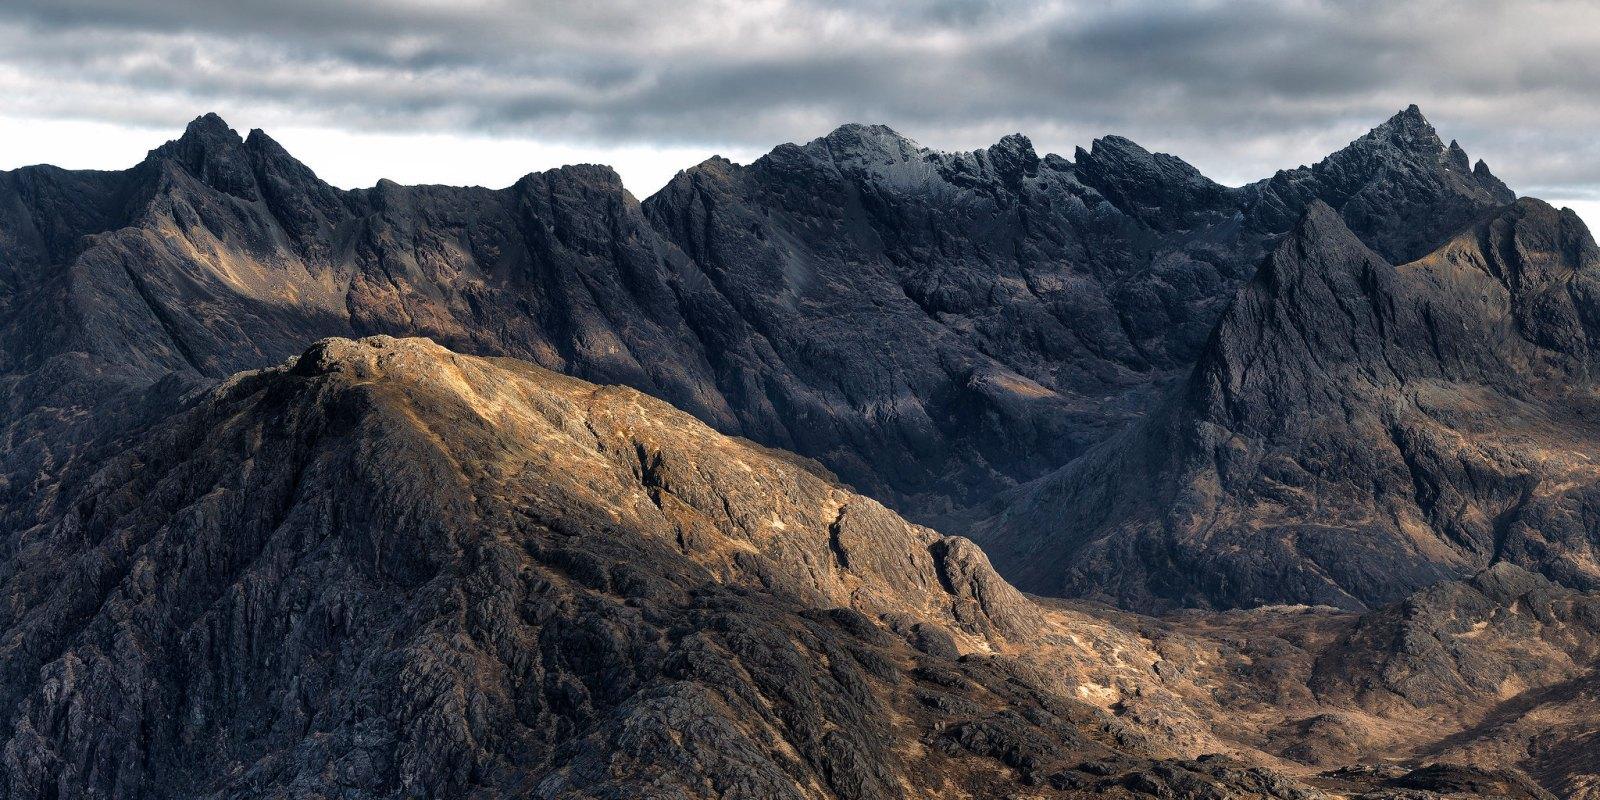 Cuillin Ridge on Skye, Scotland